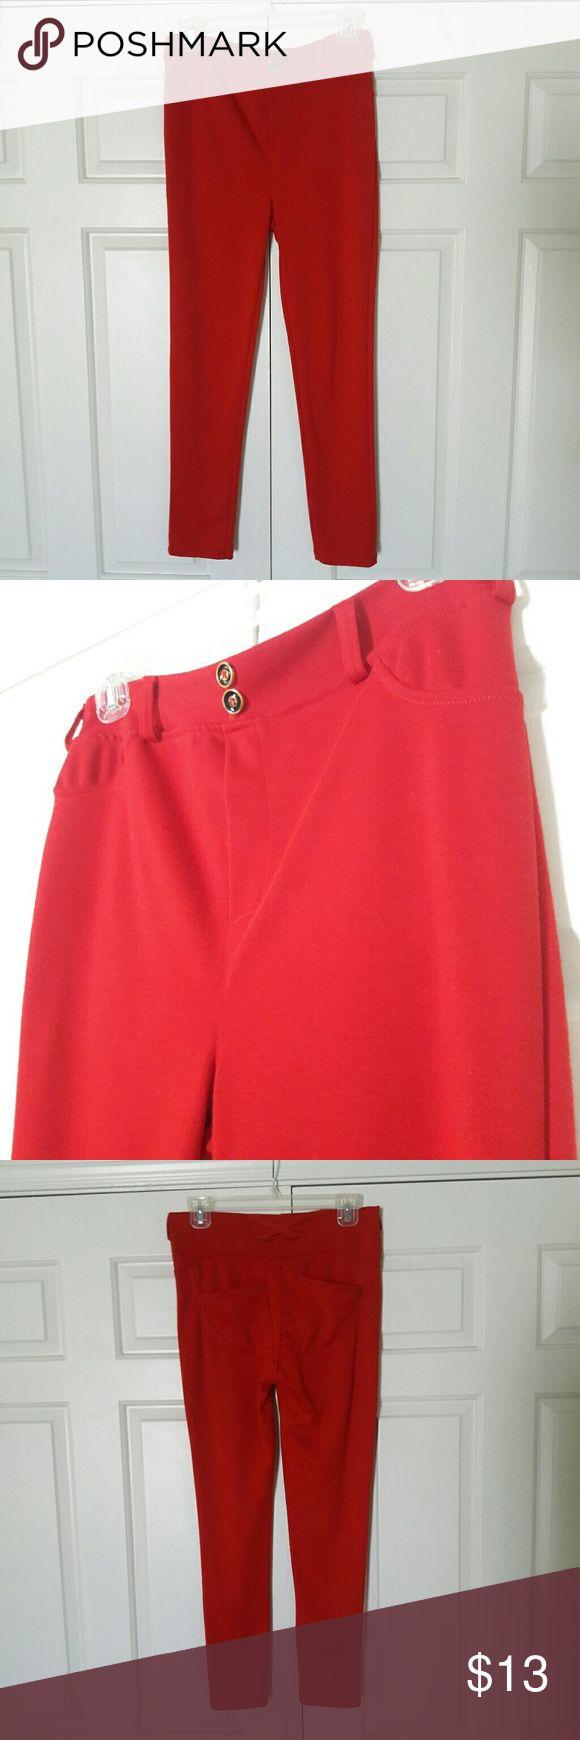 Red leggings Back pockets Pants